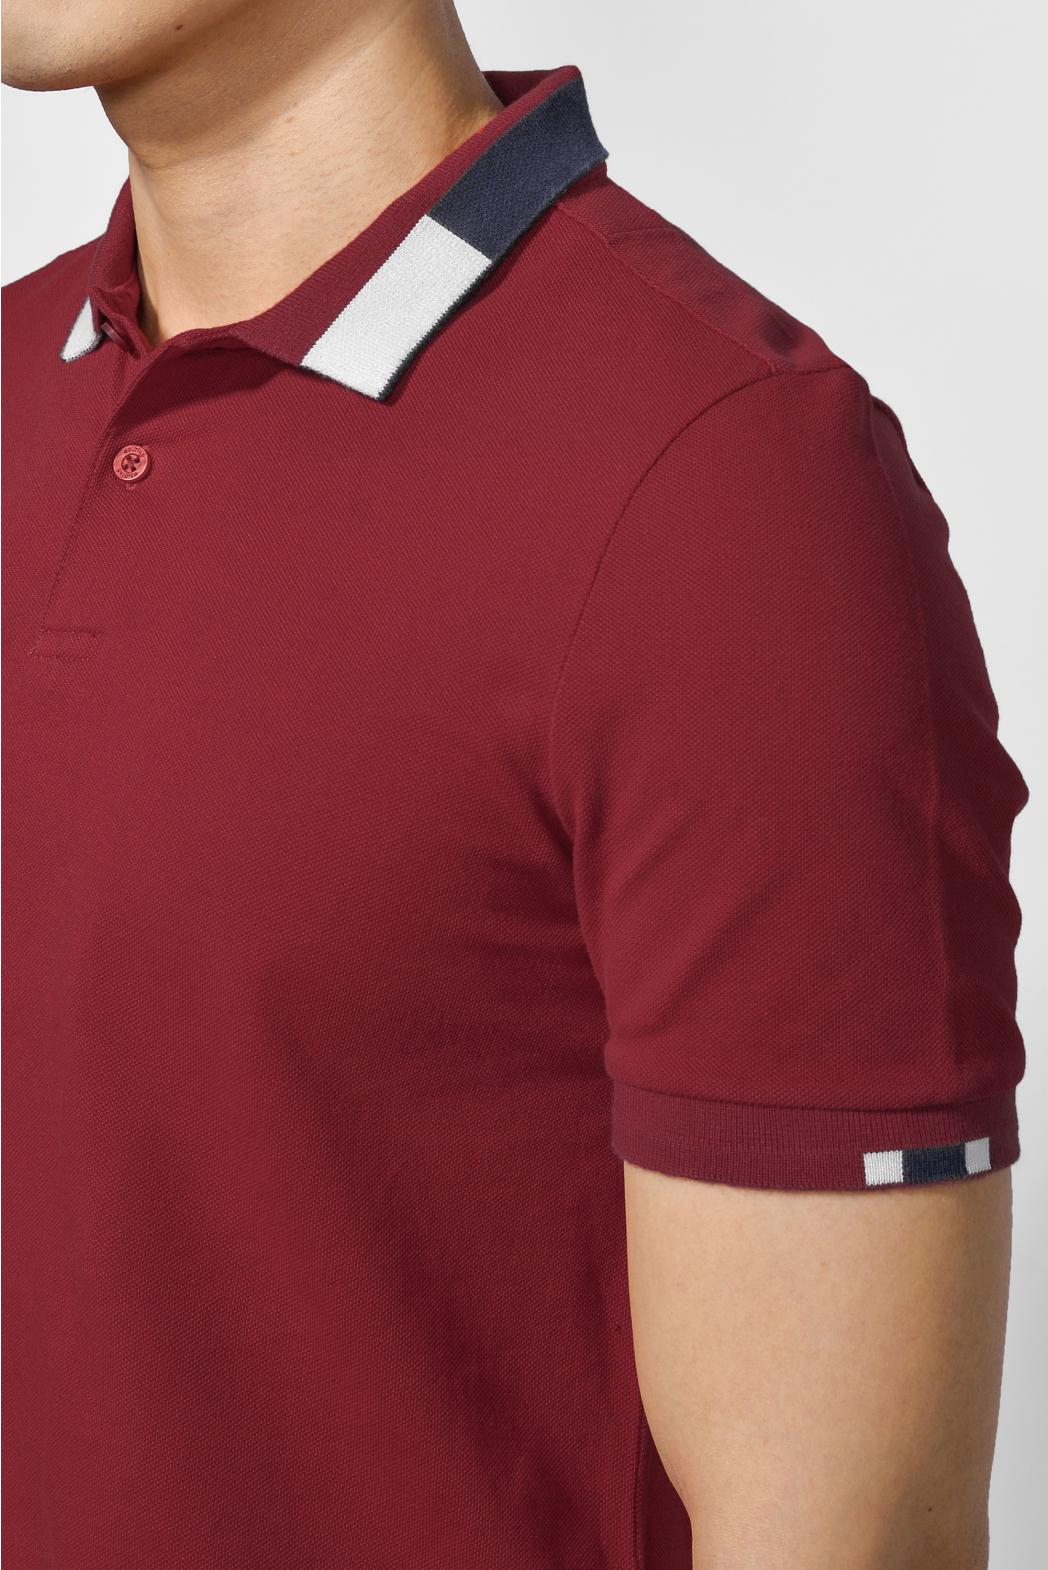 Áo polo, cổ áo phối màu. FITTED form - 10F20POL007